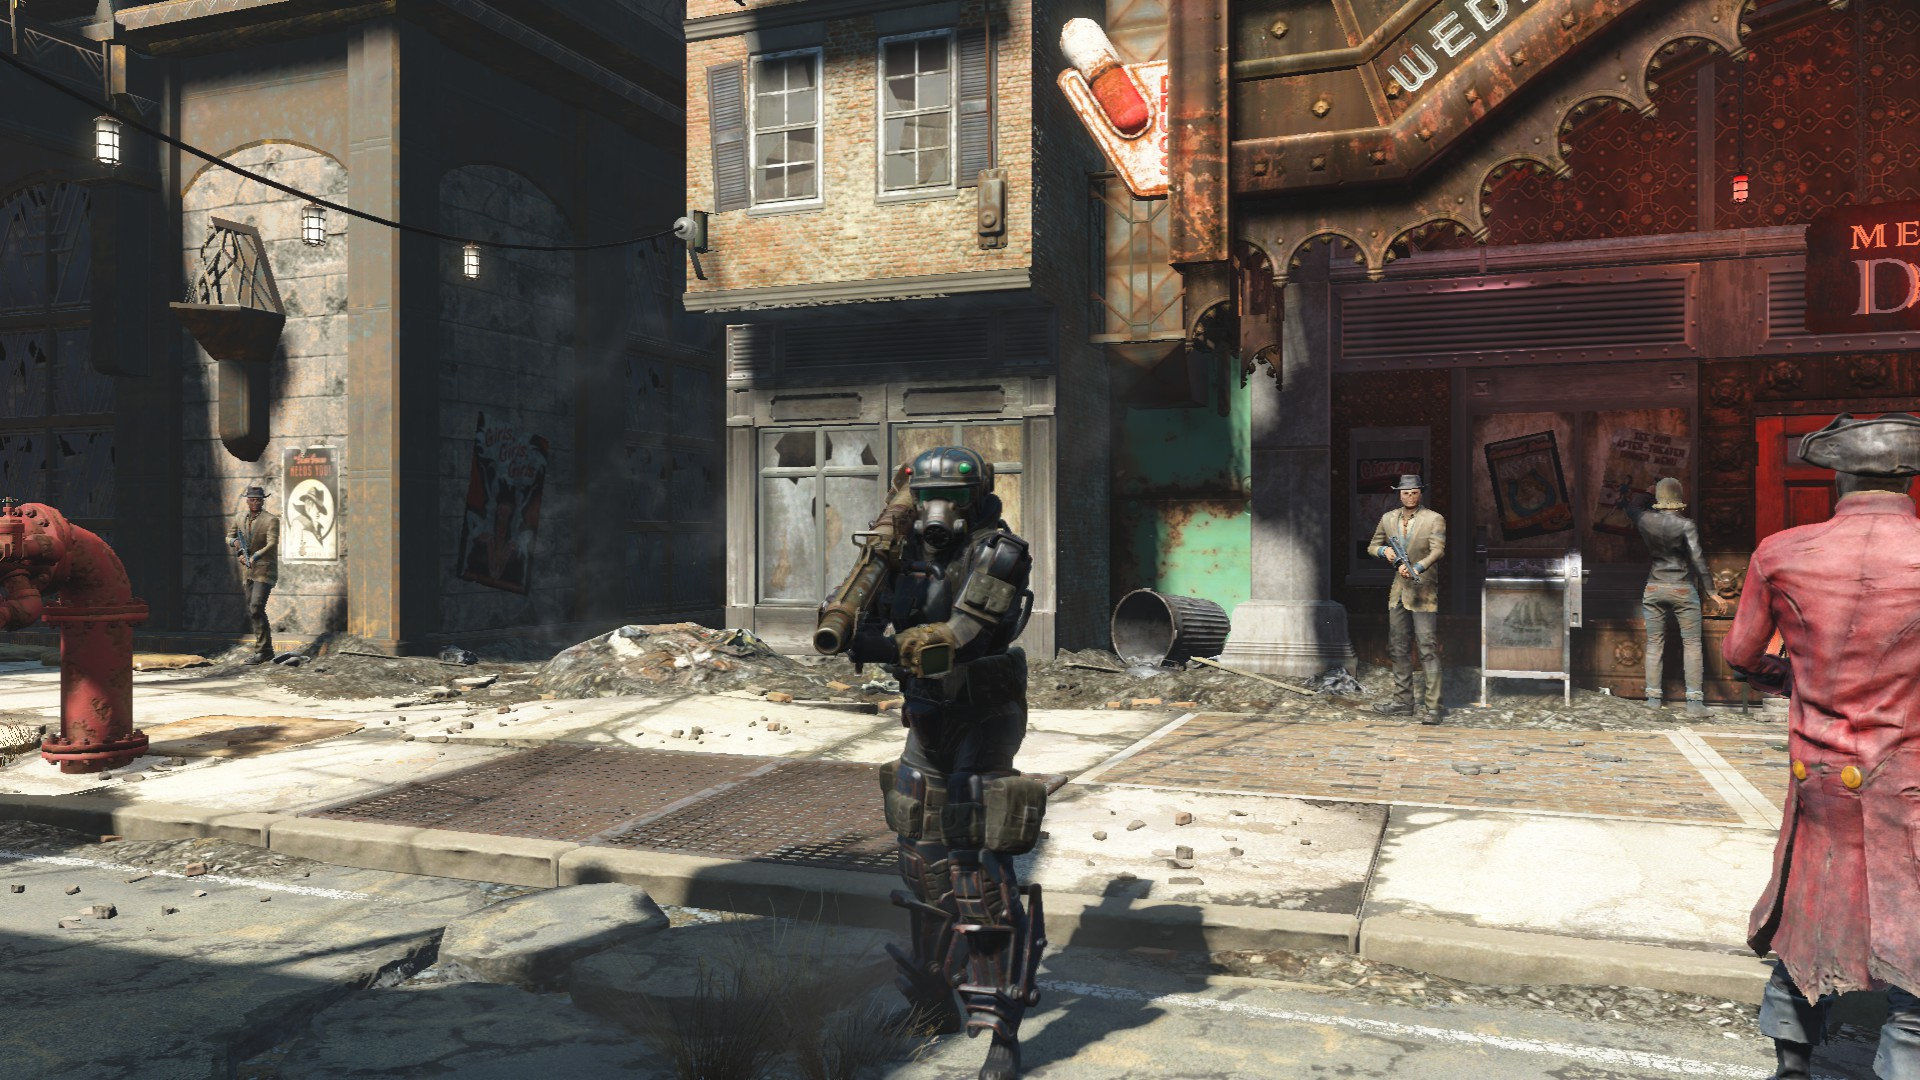 20171001135953_1.jpg - Fallout 4